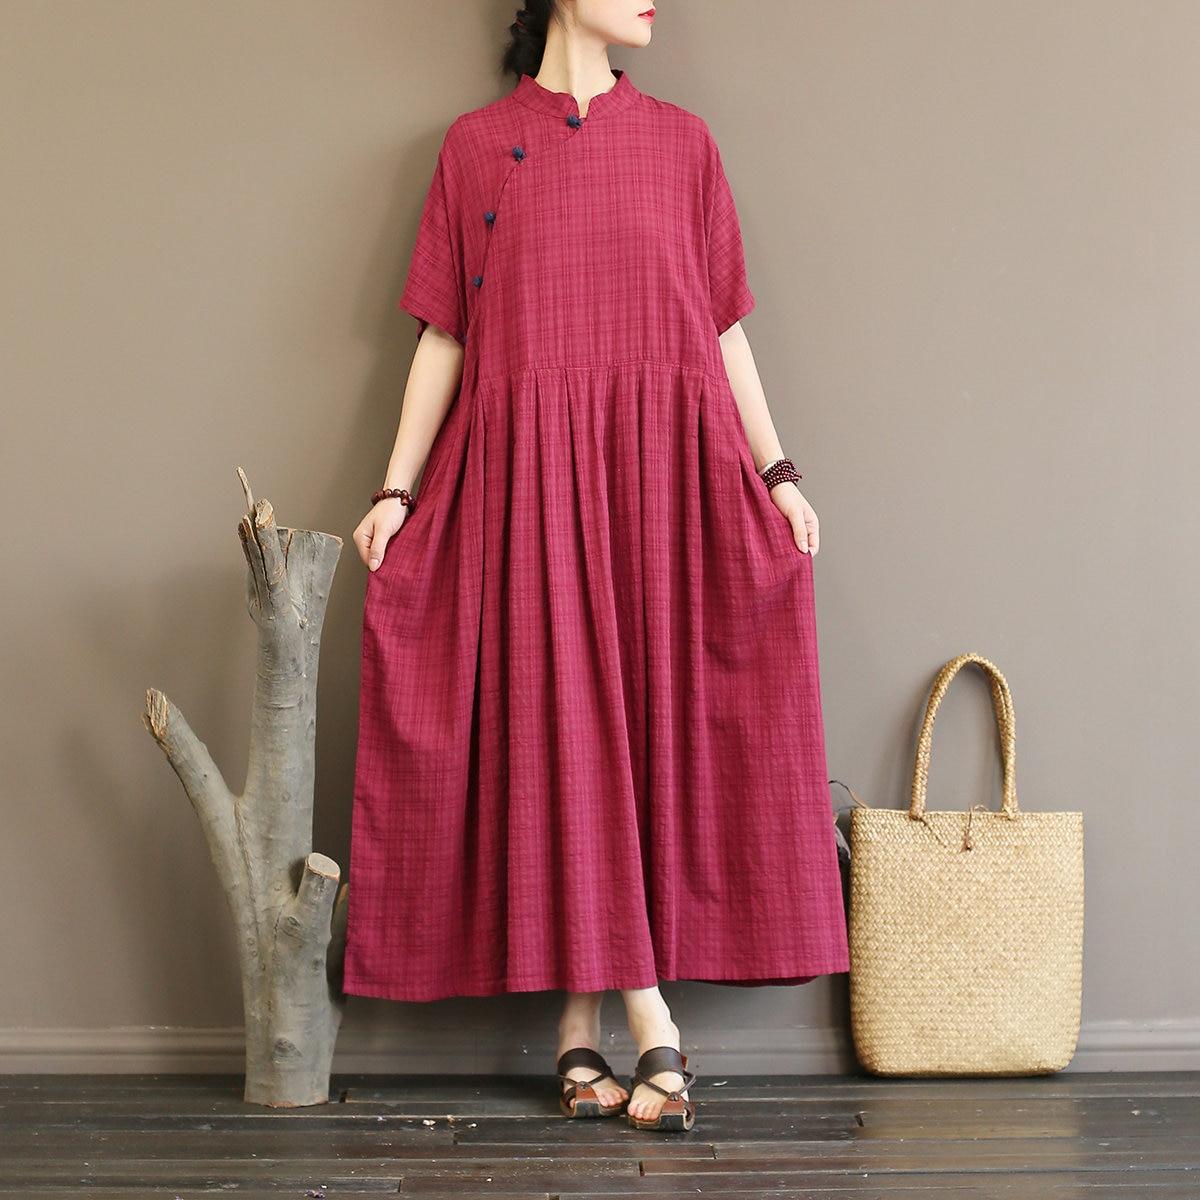 Women National Vintage Style Long Dresses Stand Collar Plate Buckle Summer High Waist Half Sleeve Loose Dresses 1